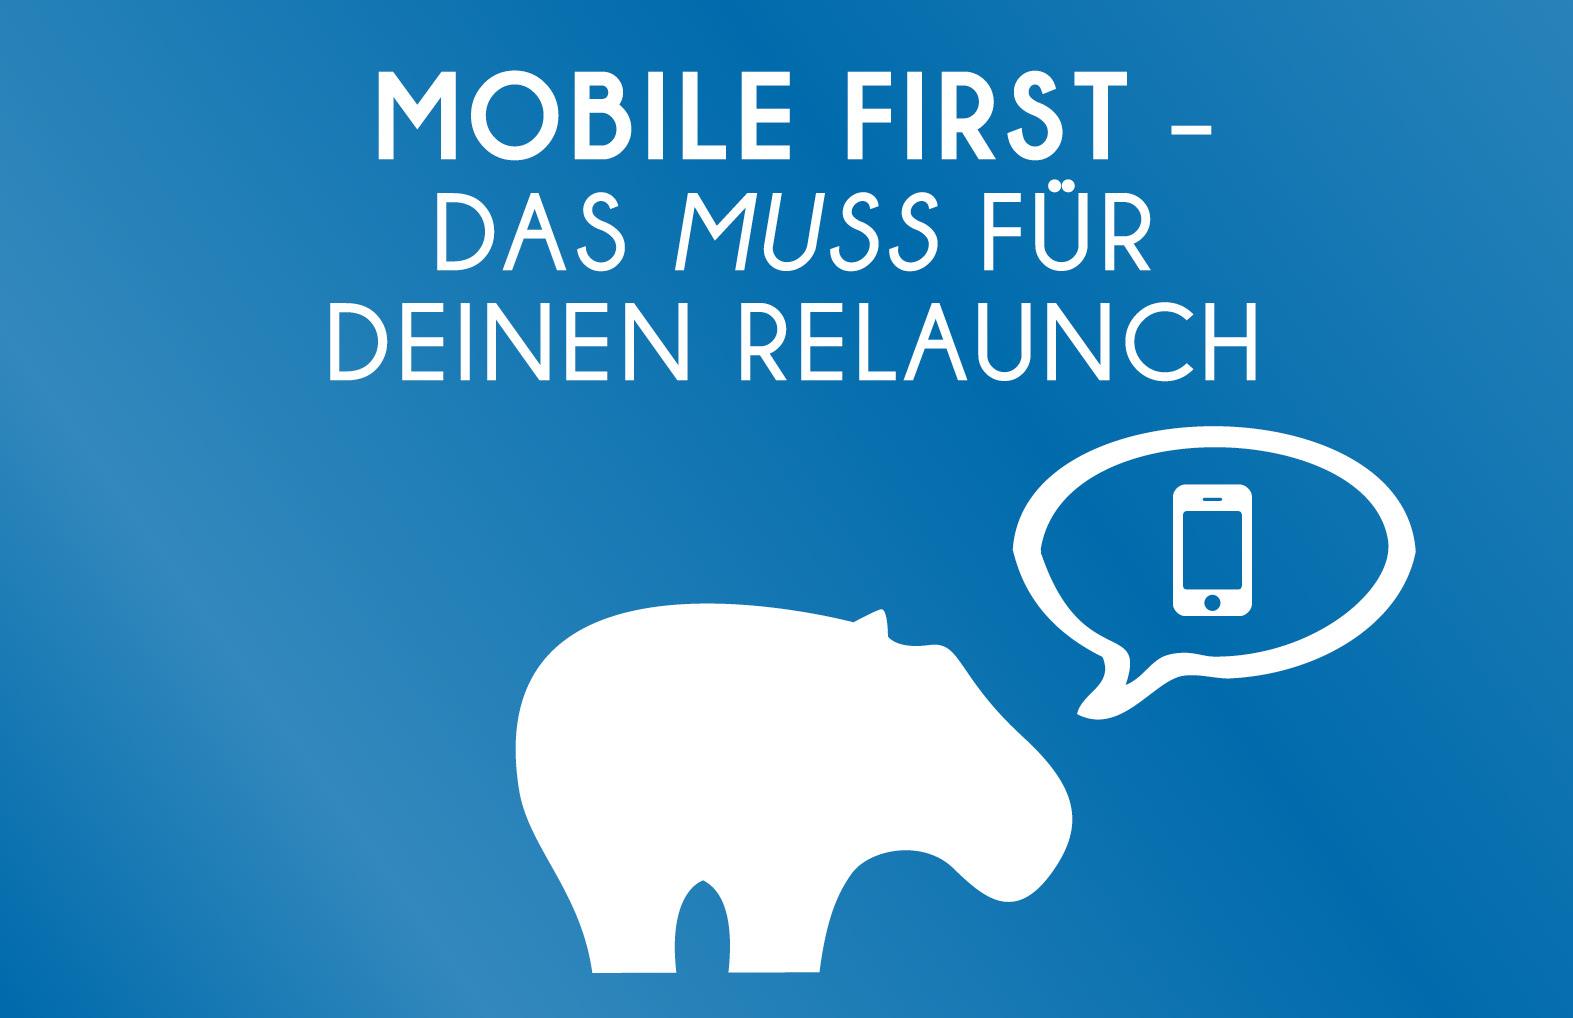 Mobile First - Dass MUSS für Deinen Relaunch